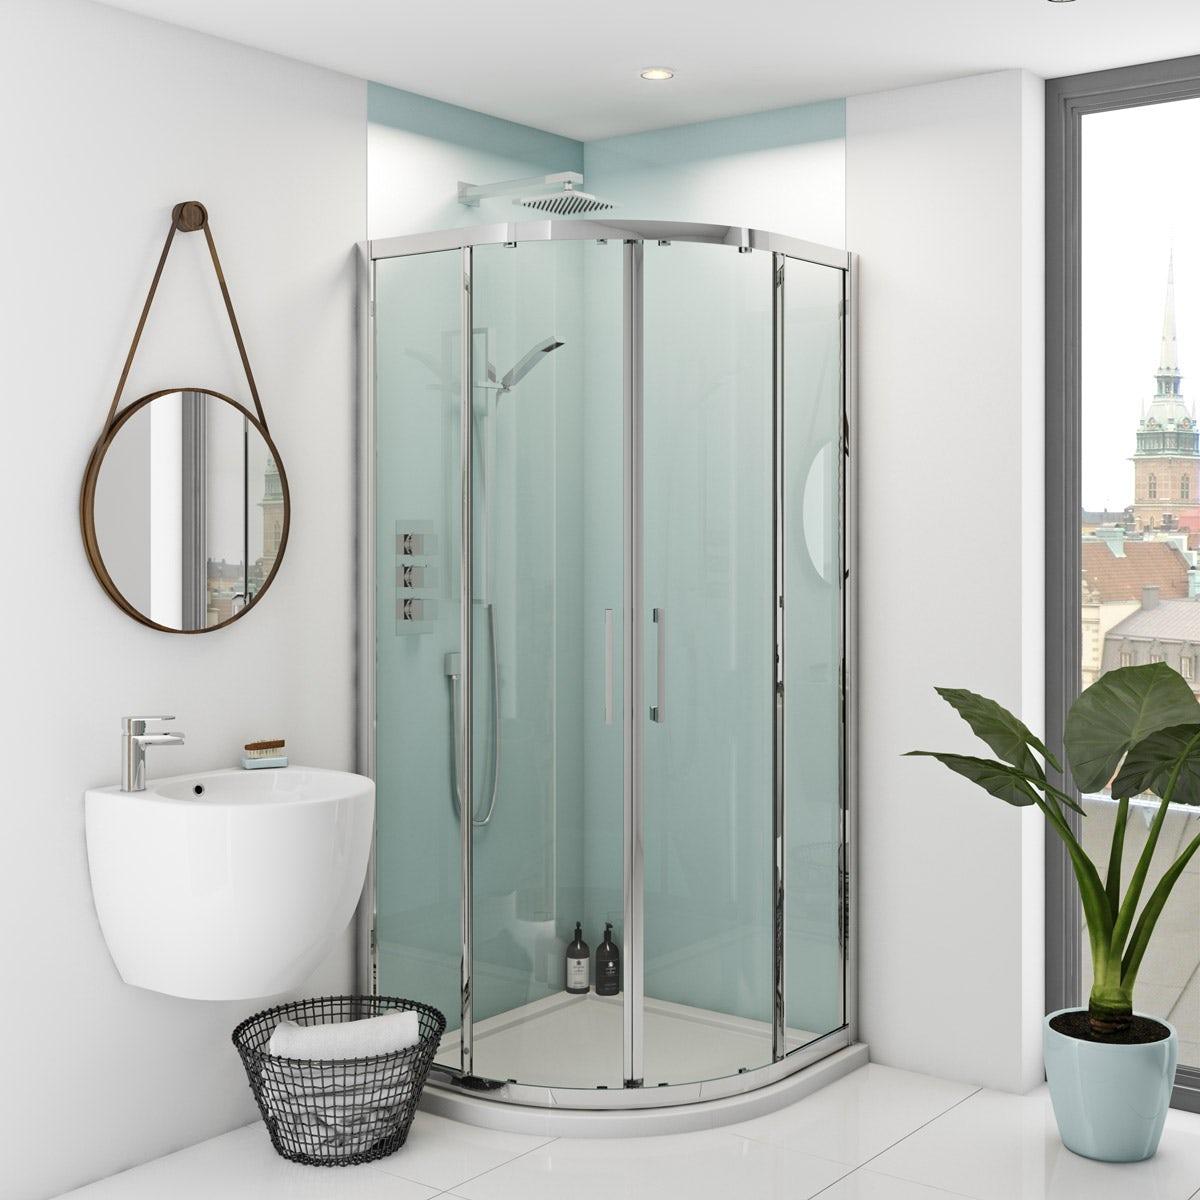 zenolite plus air acrylic shower wall panel corner